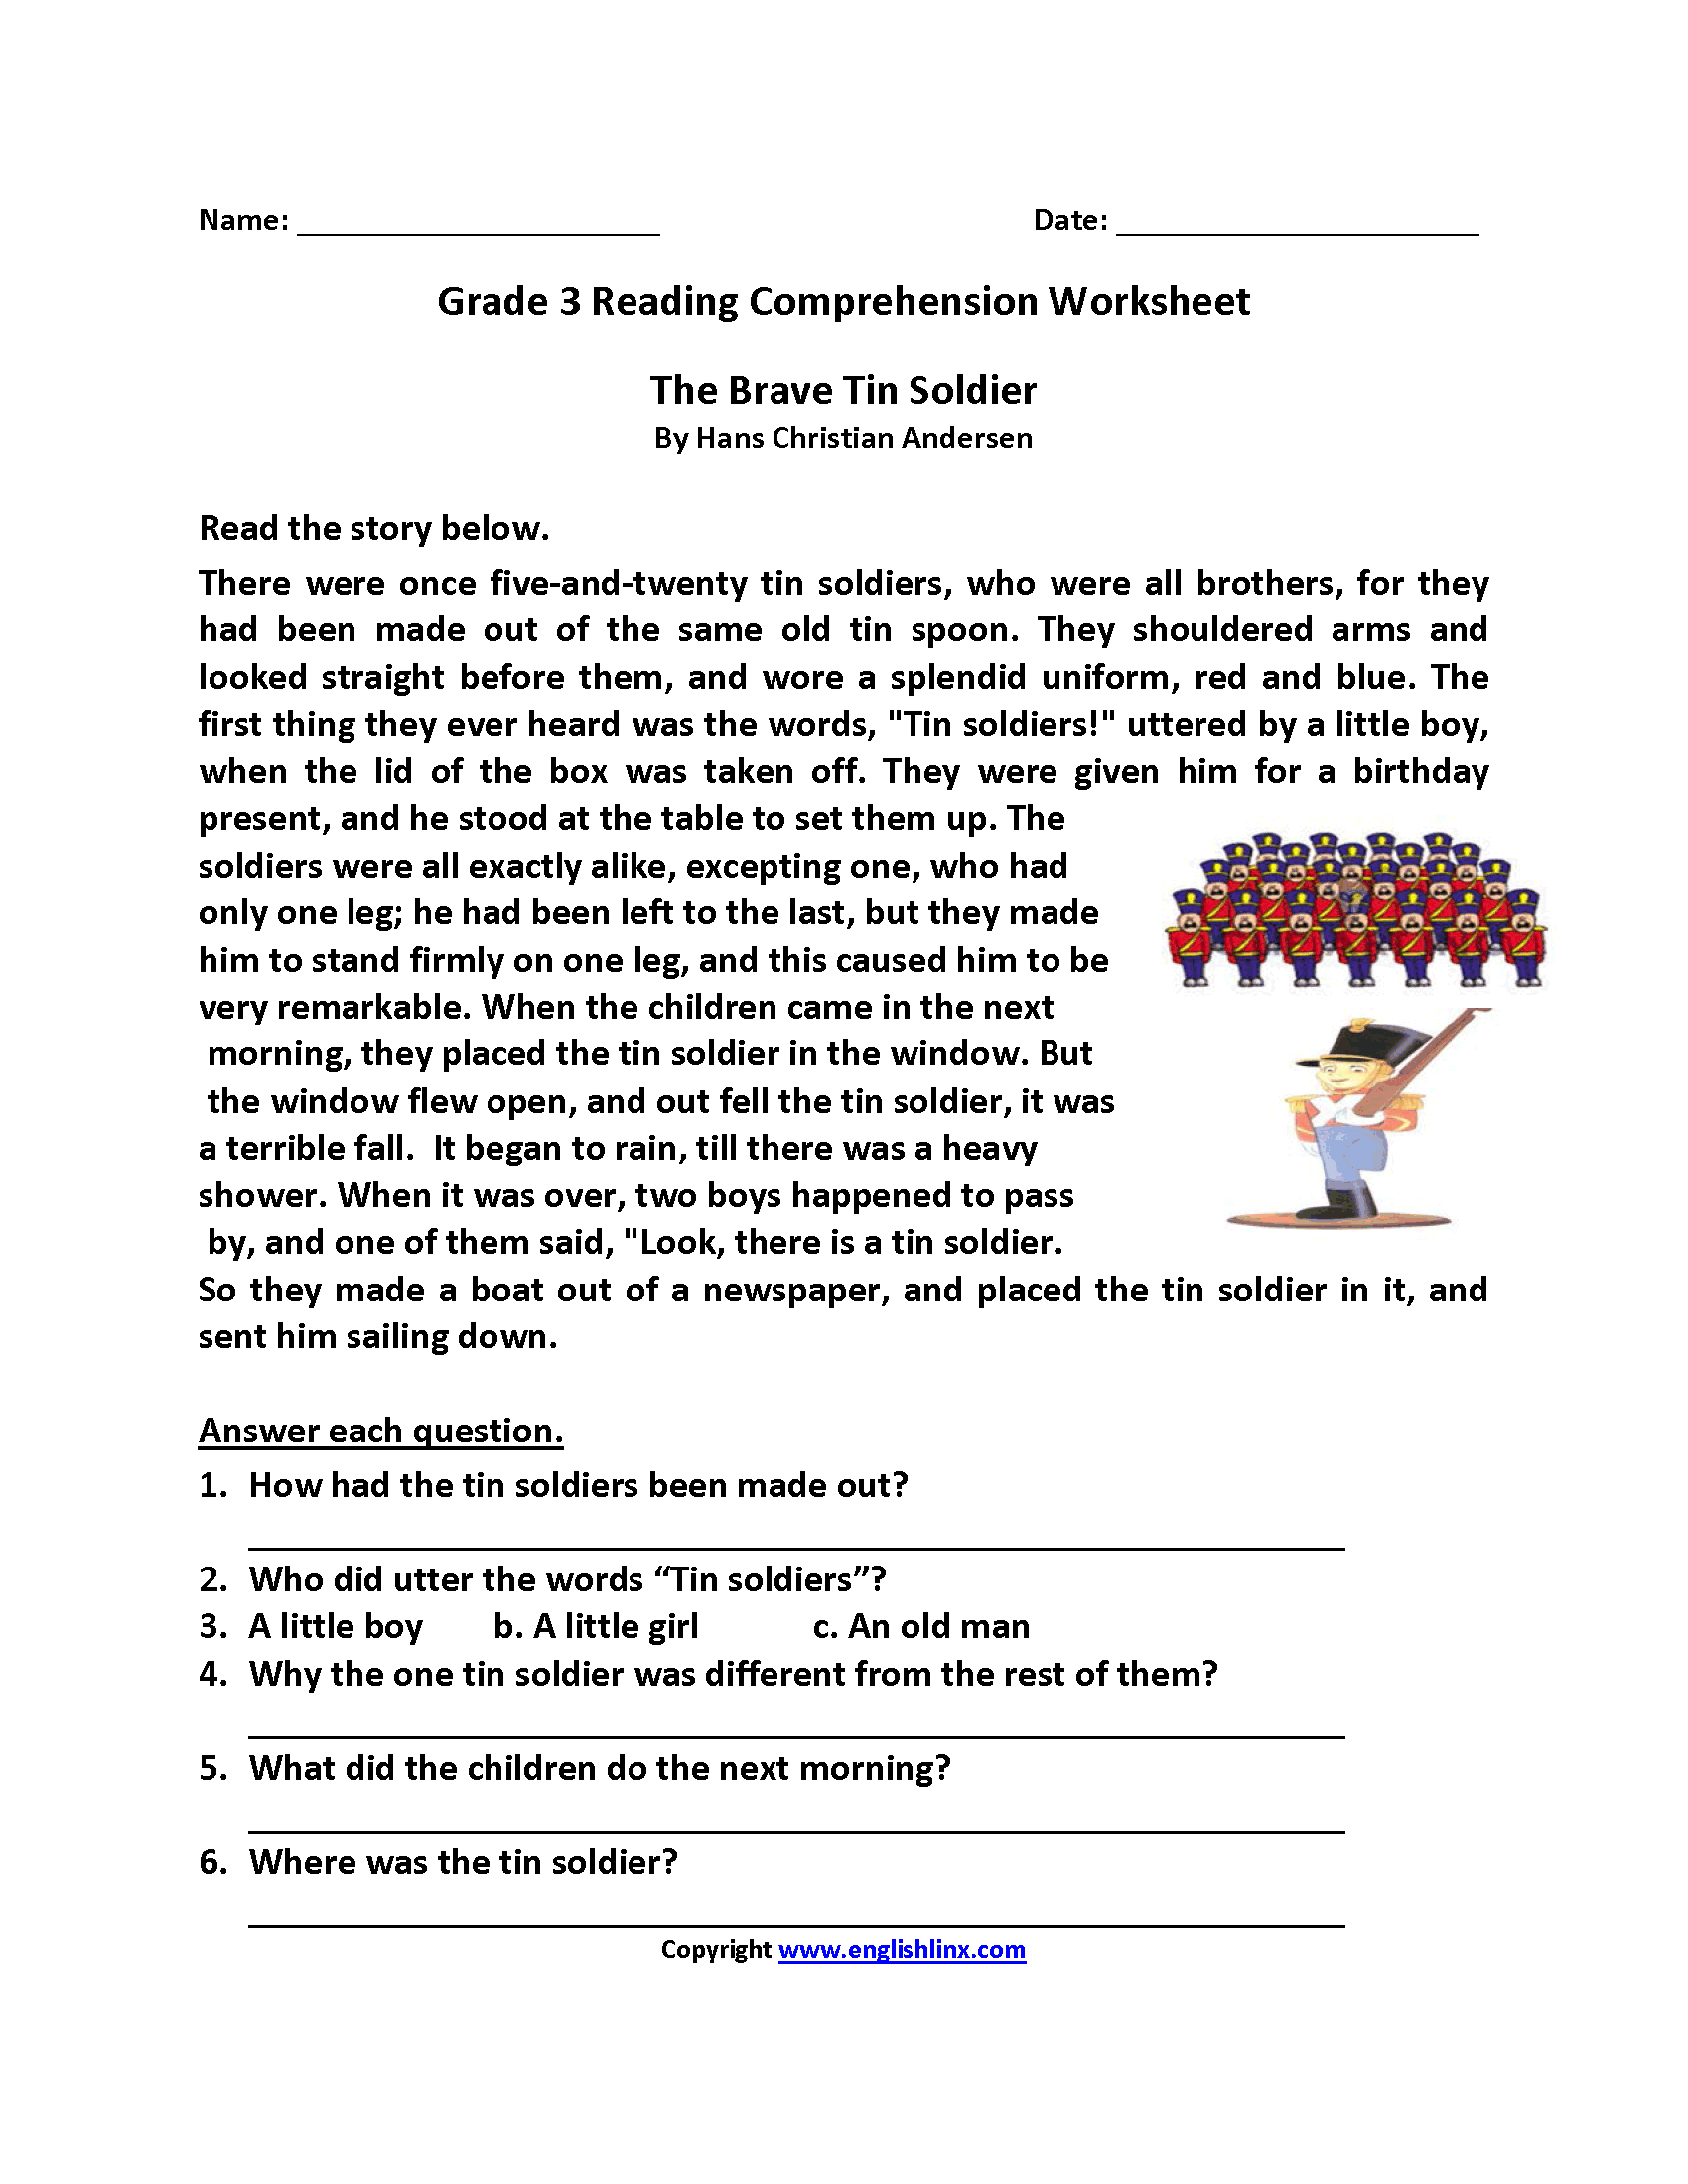 Free Printable Reading Comprehension Worksheets 3Rd Grade For Free | Third Grade Reading Worksheets Free Printable